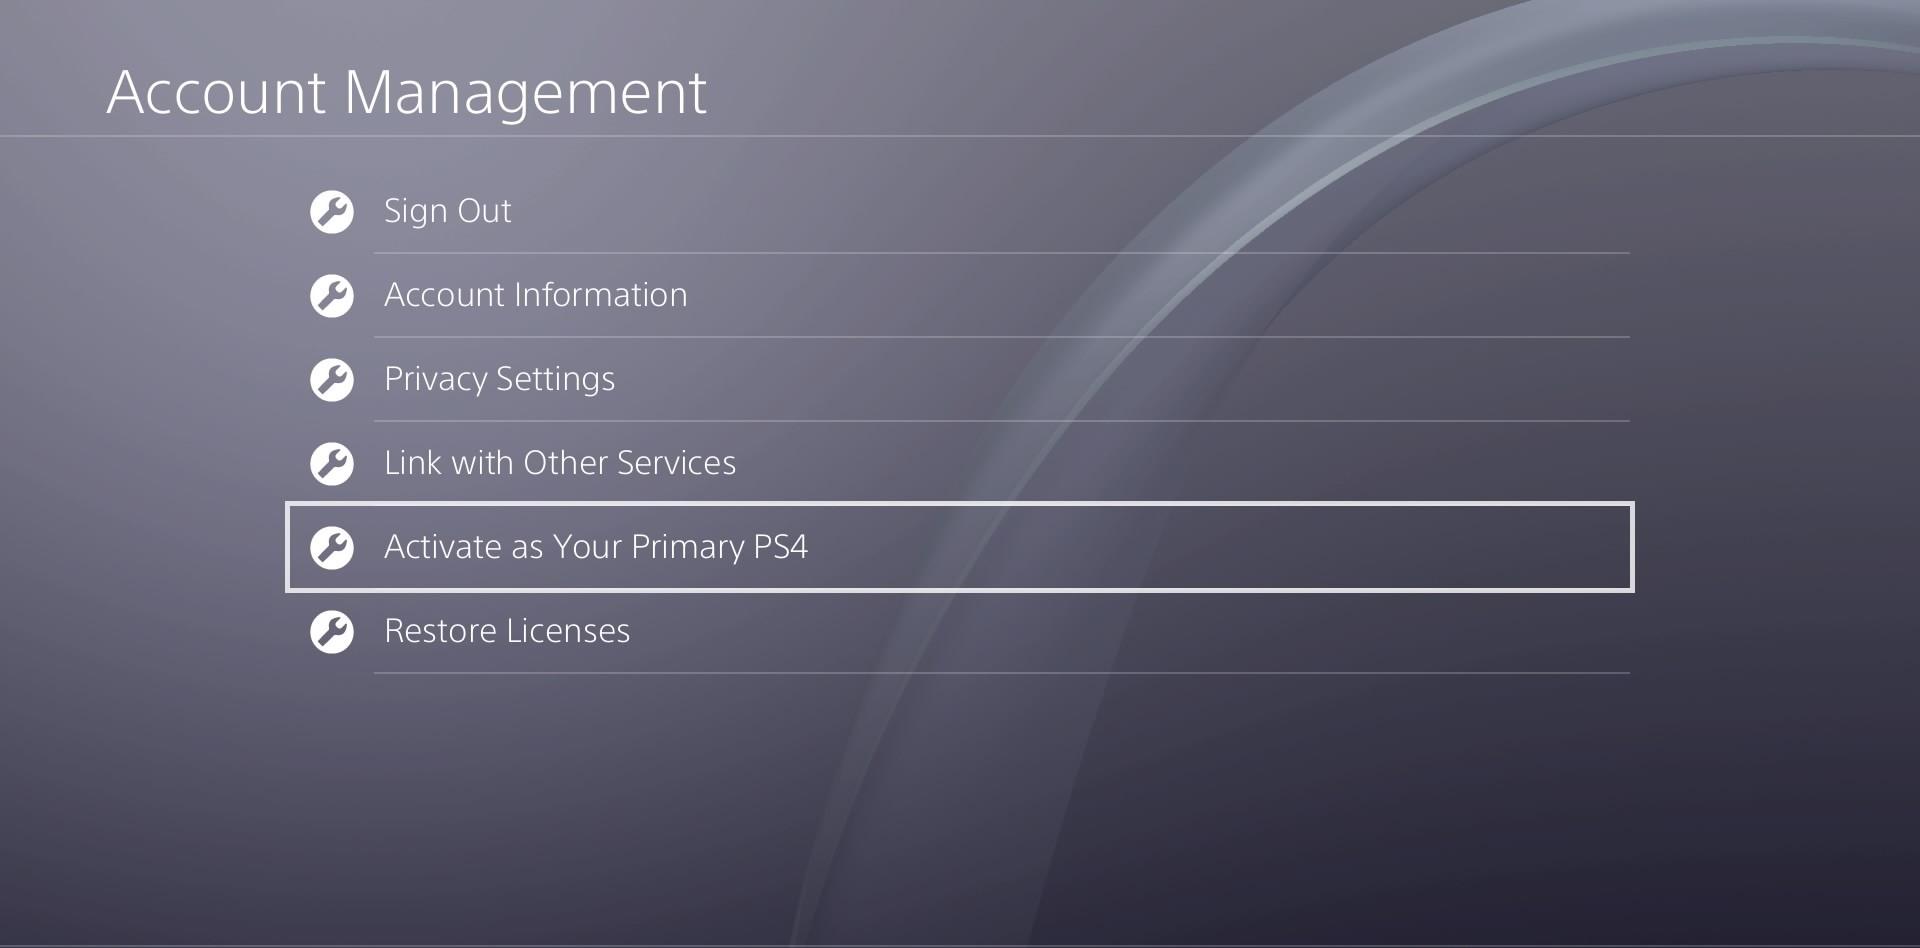 قم بالنزول للأسفل ثم اضغط على Activate as Your Primary PS4